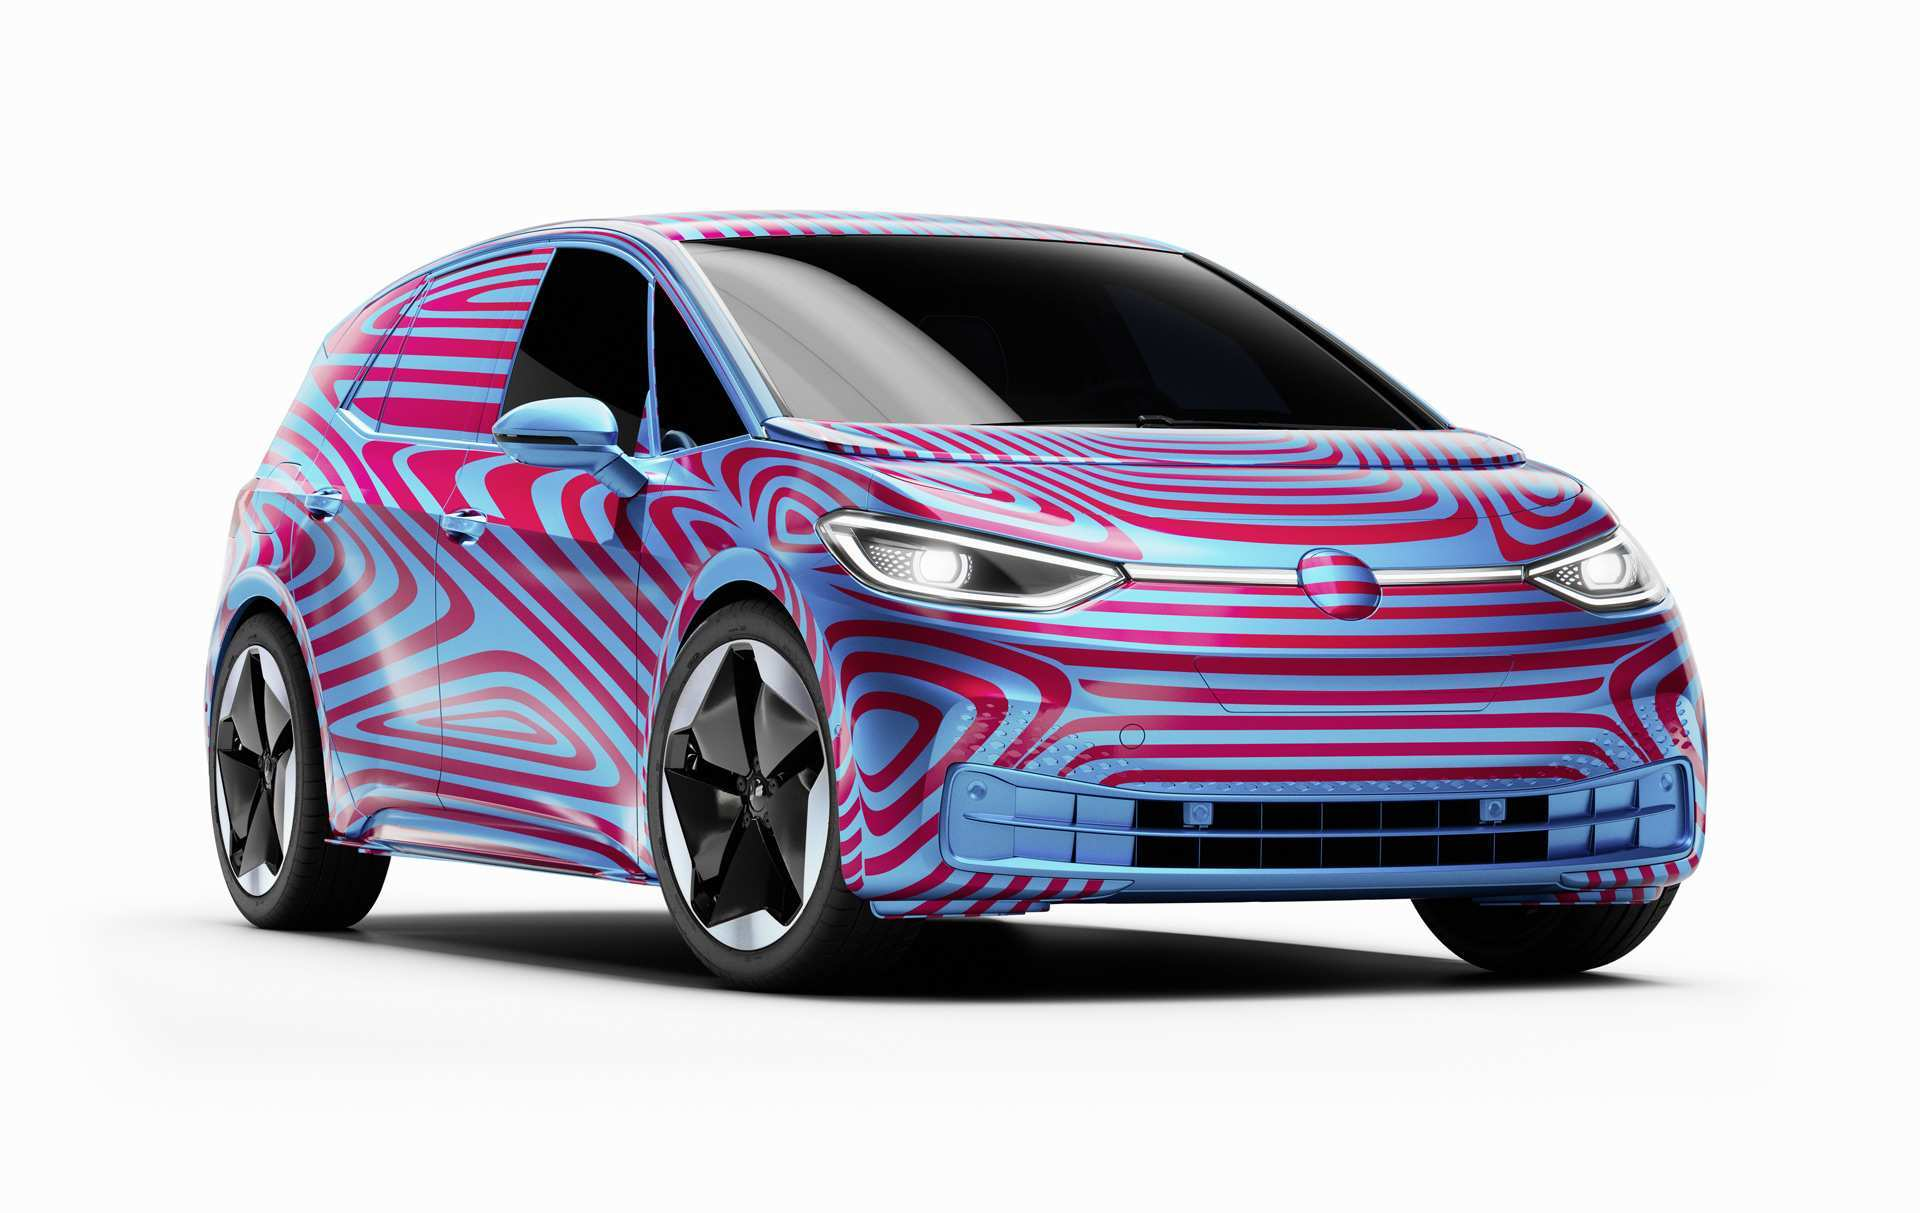 15 New Volkswagen Id 3 2020 Prices by Volkswagen Id 3 2020